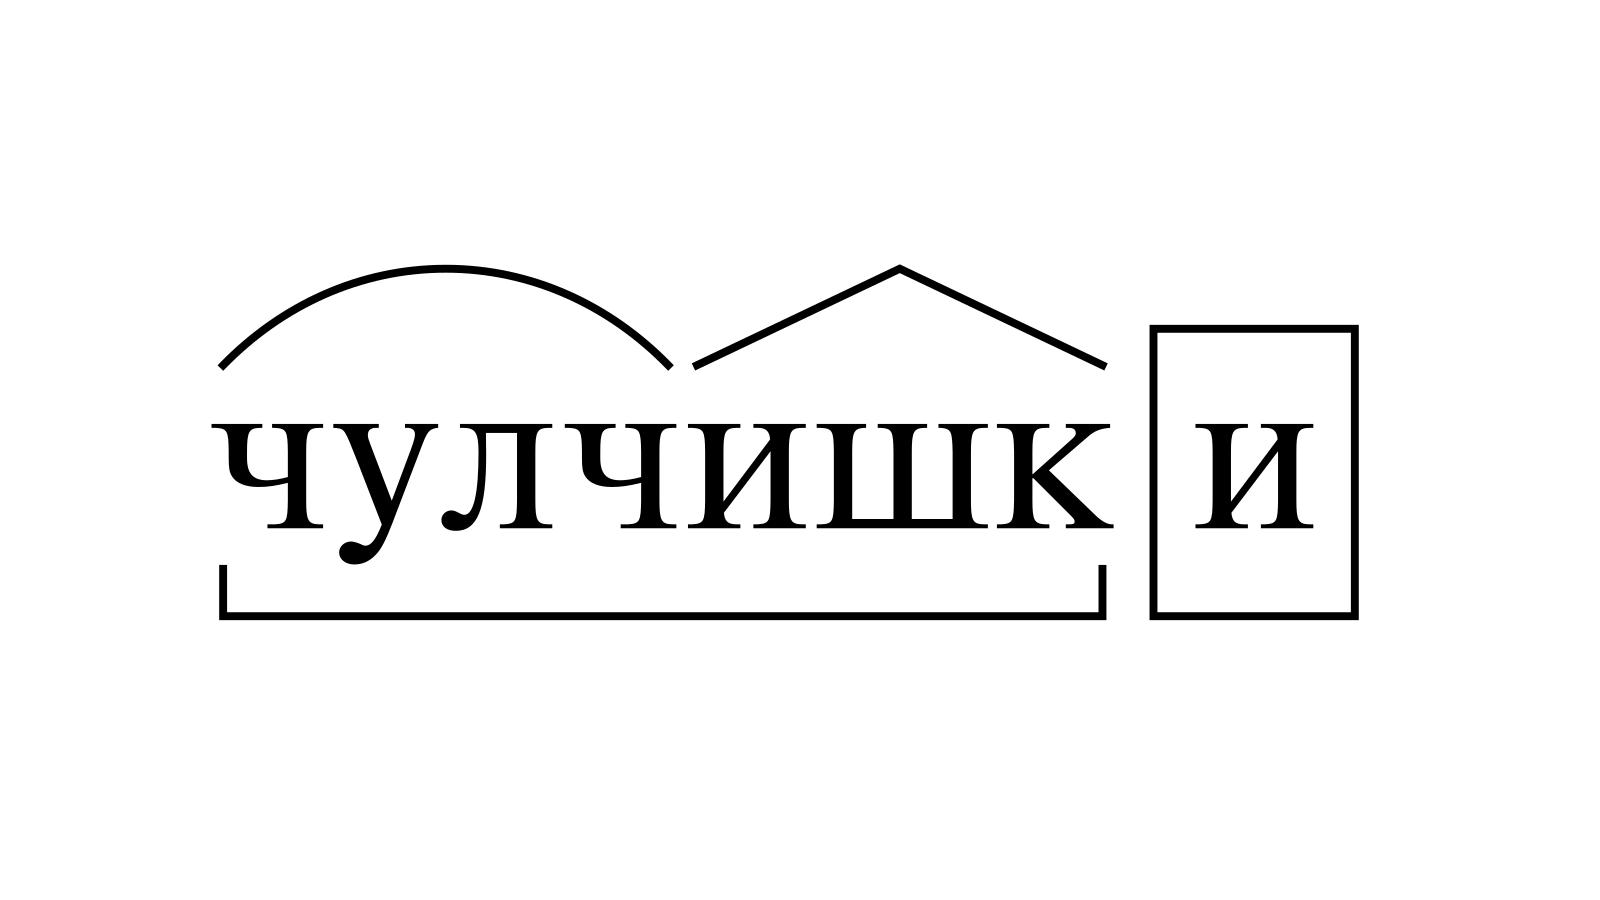 Разбор слова «чулчишки» по составу